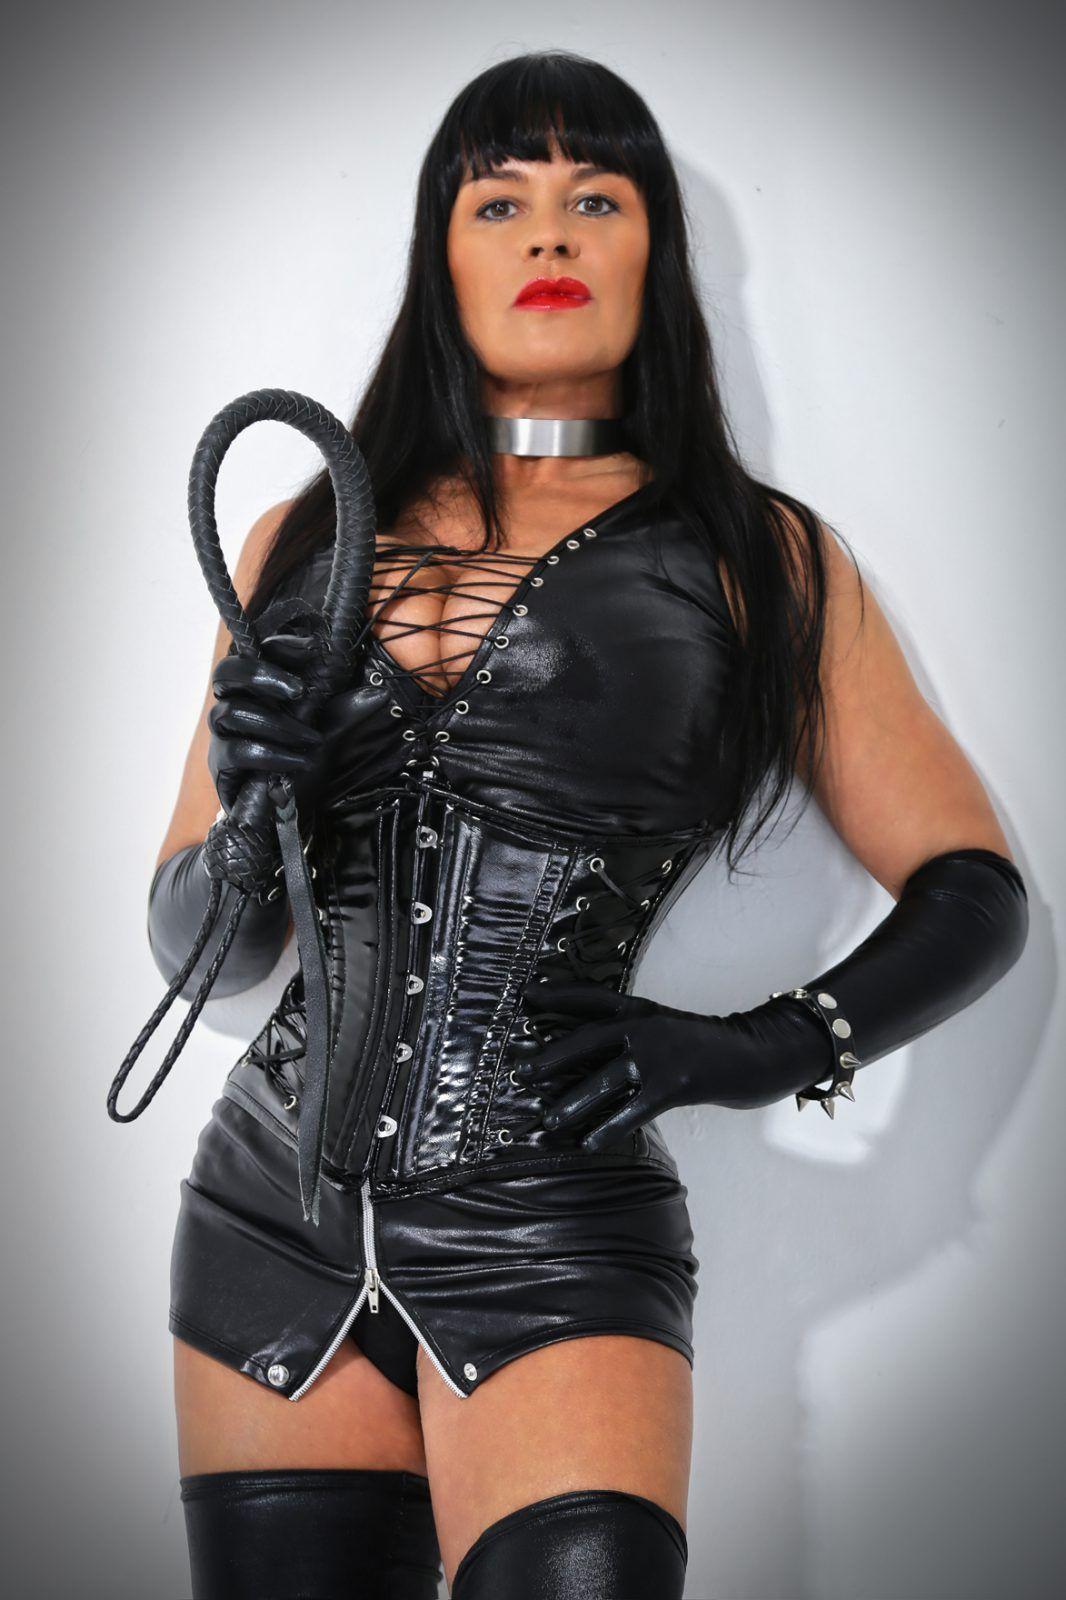 mature female authority : photo | yummy | pinterest | dominatrix